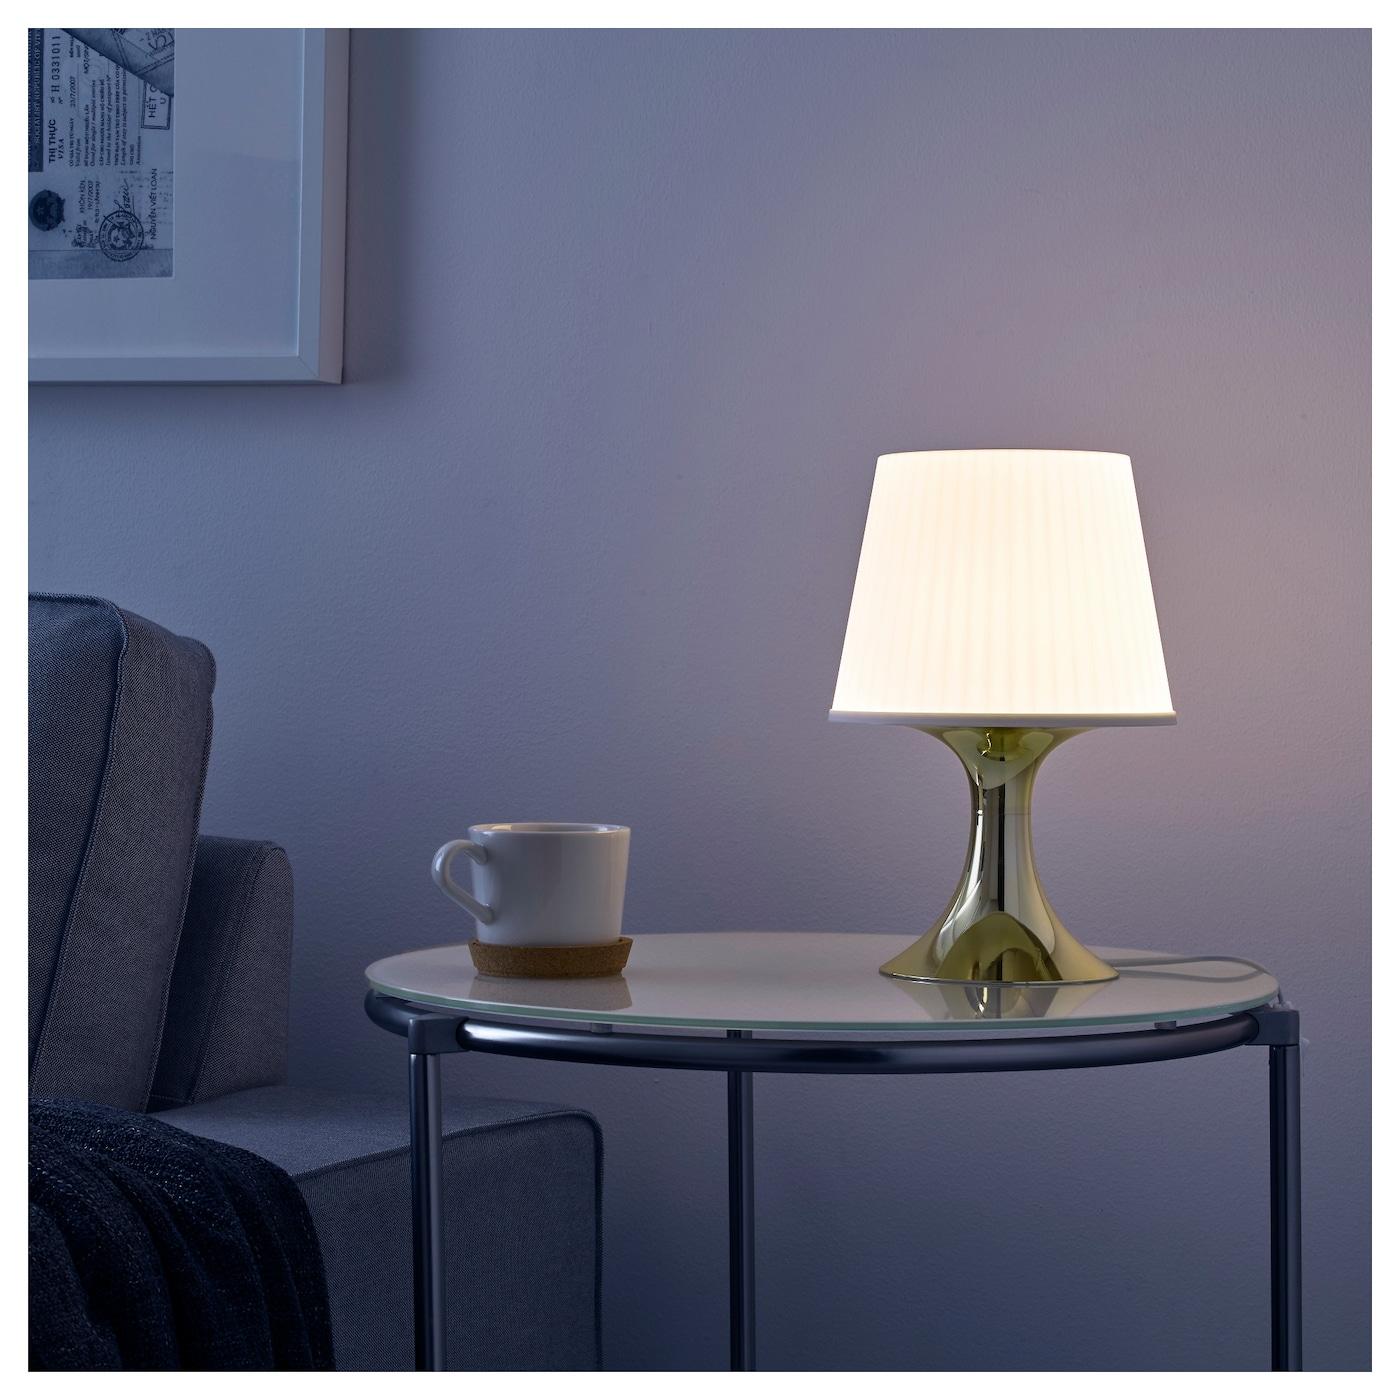 lampan lampe de table couleur or ikea. Black Bedroom Furniture Sets. Home Design Ideas